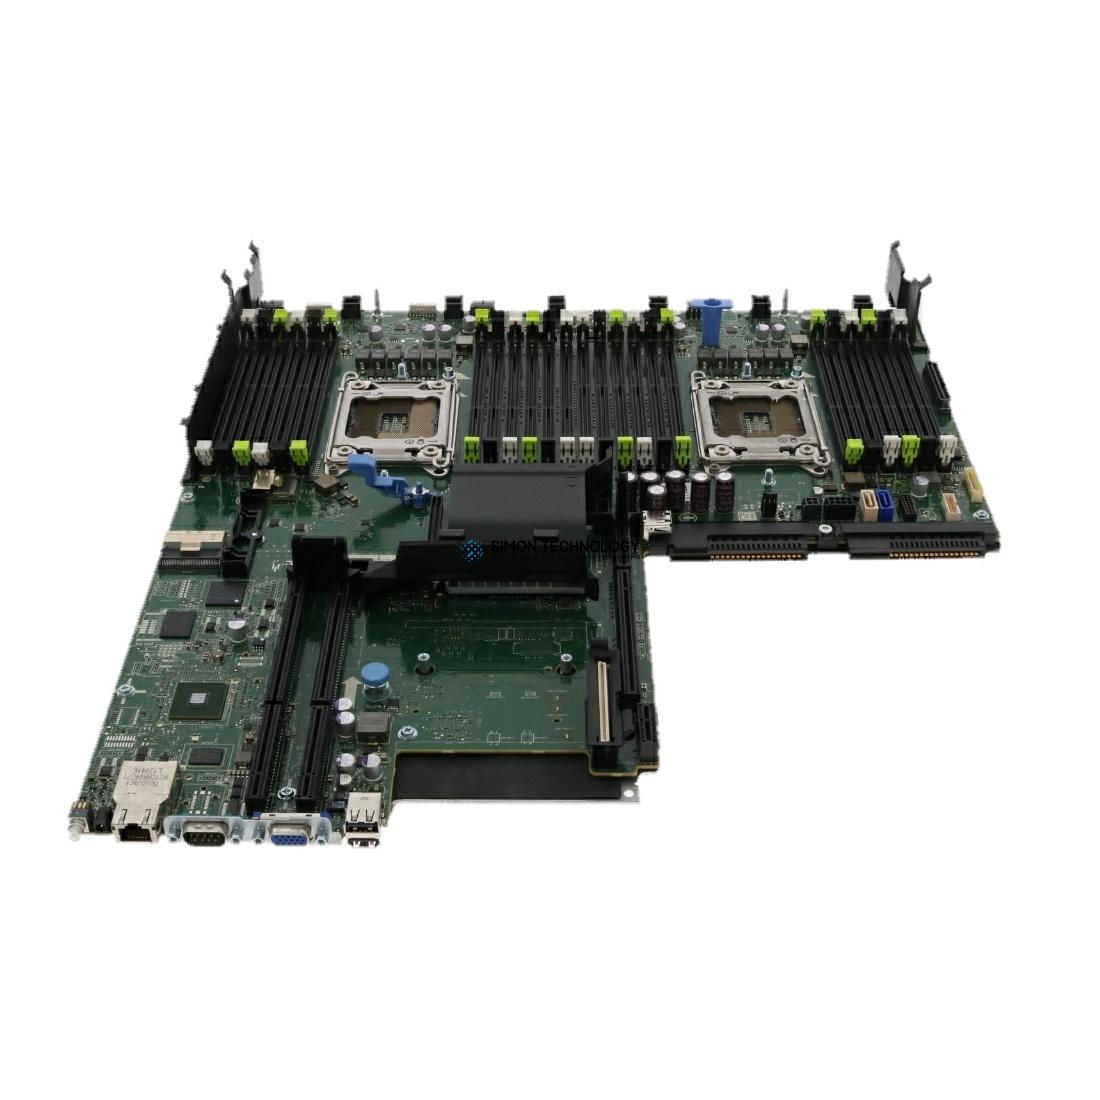 Материнская плата Dell PowerEdge R720 16x2.5 C4Y3R Ask for custom qoute (PER720-SFF-16-C4Y3R)